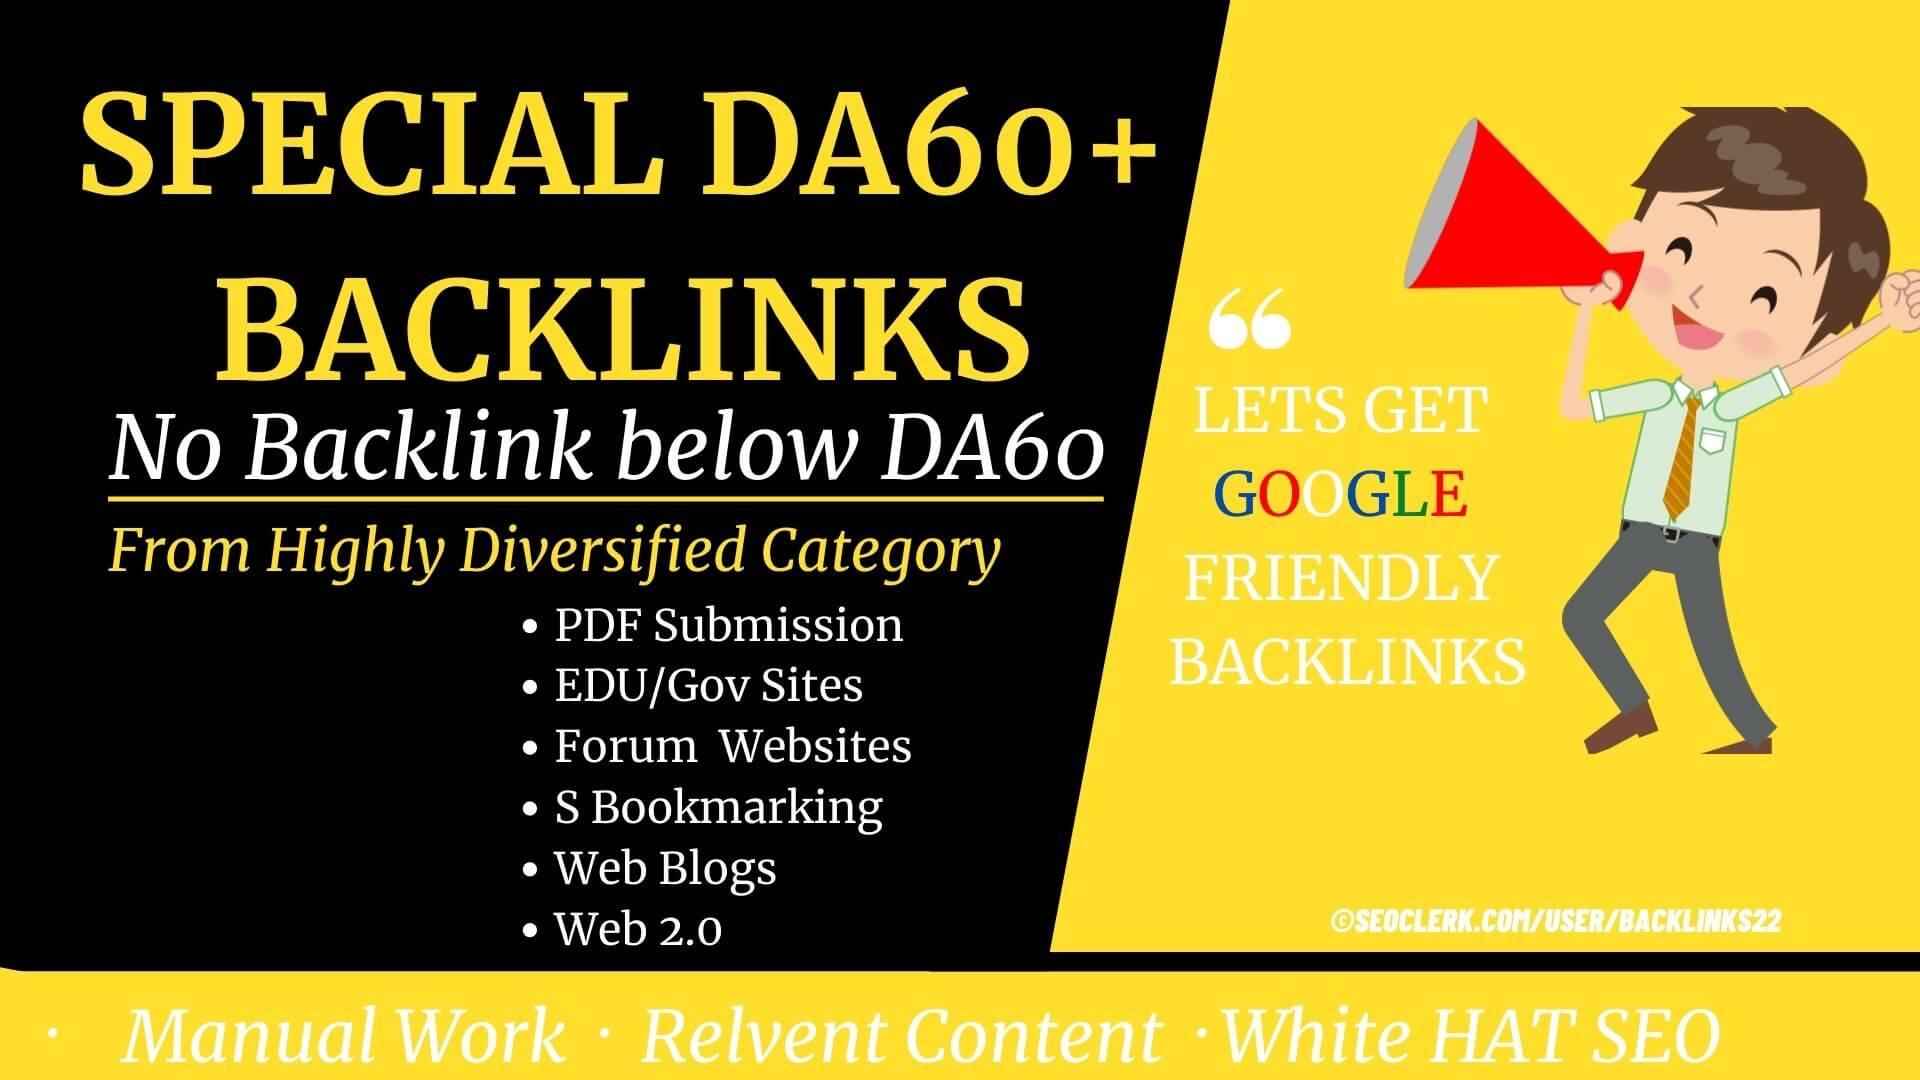 Only DA100 to DA60+ Backlinks- 103 Premium Backlinks for high competition keyword